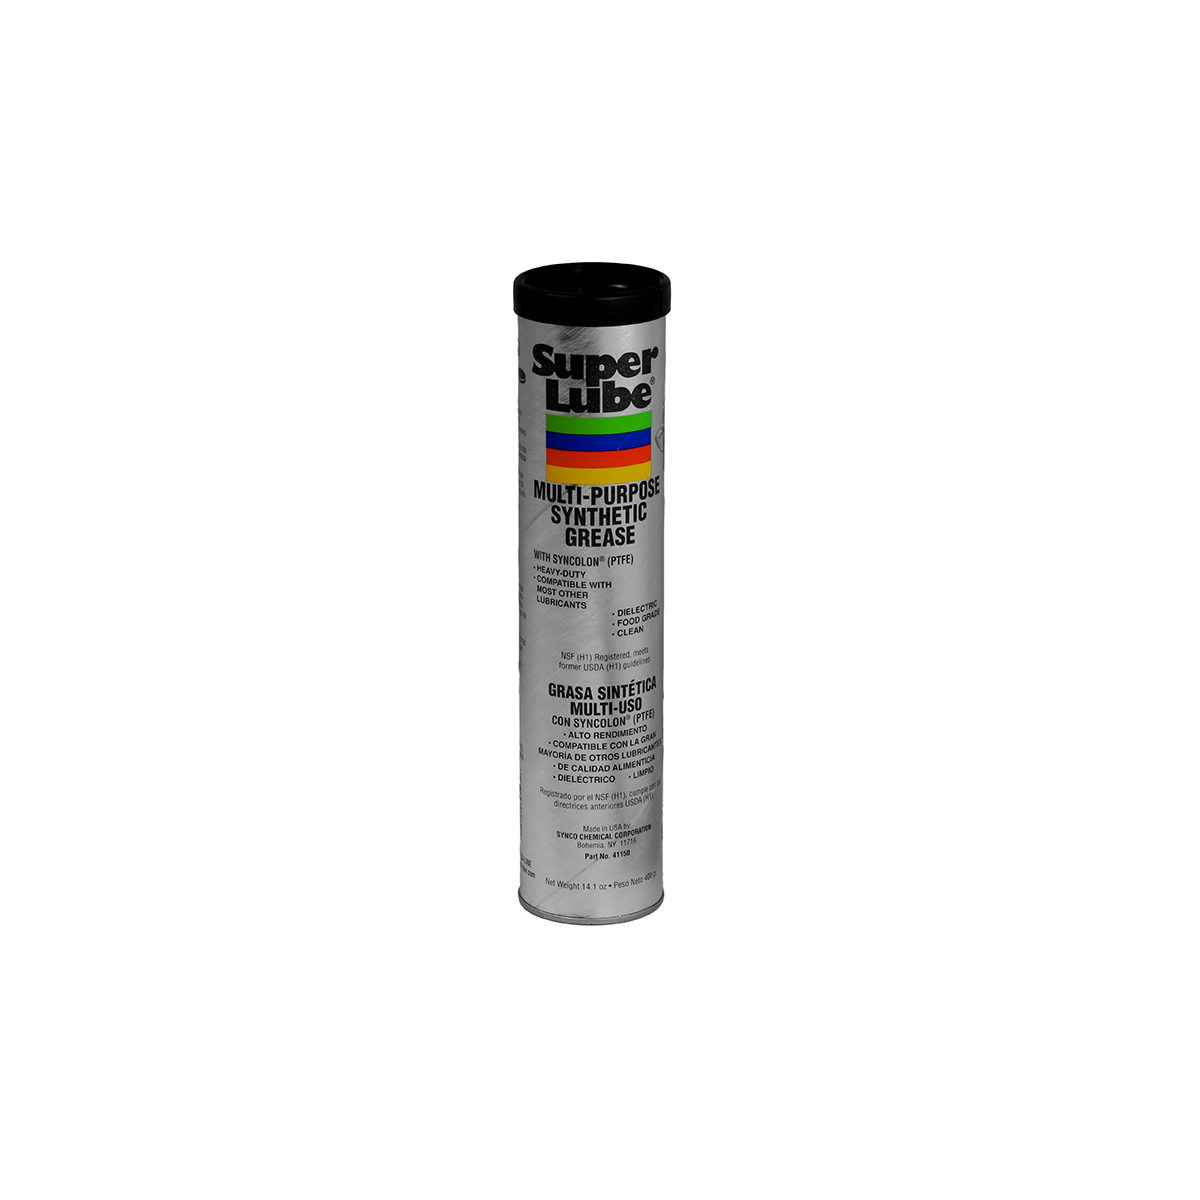 Super lube 41150 cartridge food grade grease alfa international - Food grade grease kitchenaid ...